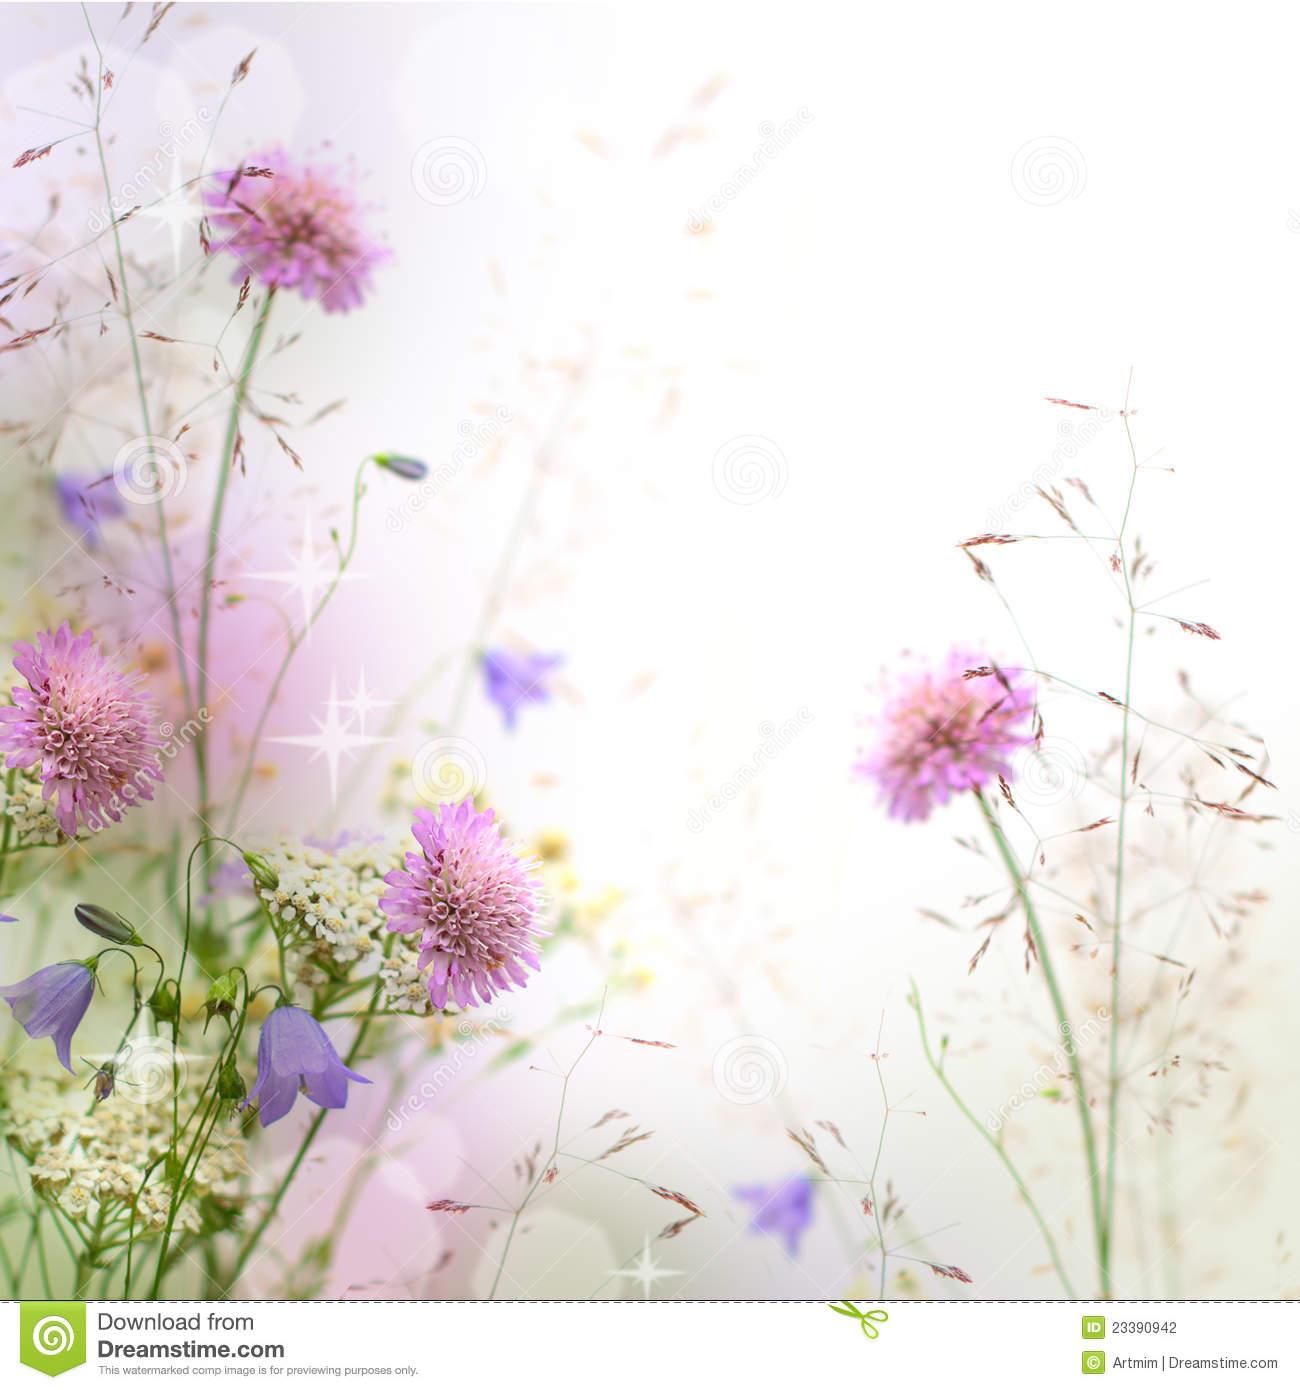 Free Download Compastelpastel Purple Rose Flowers Floral Wallpaper